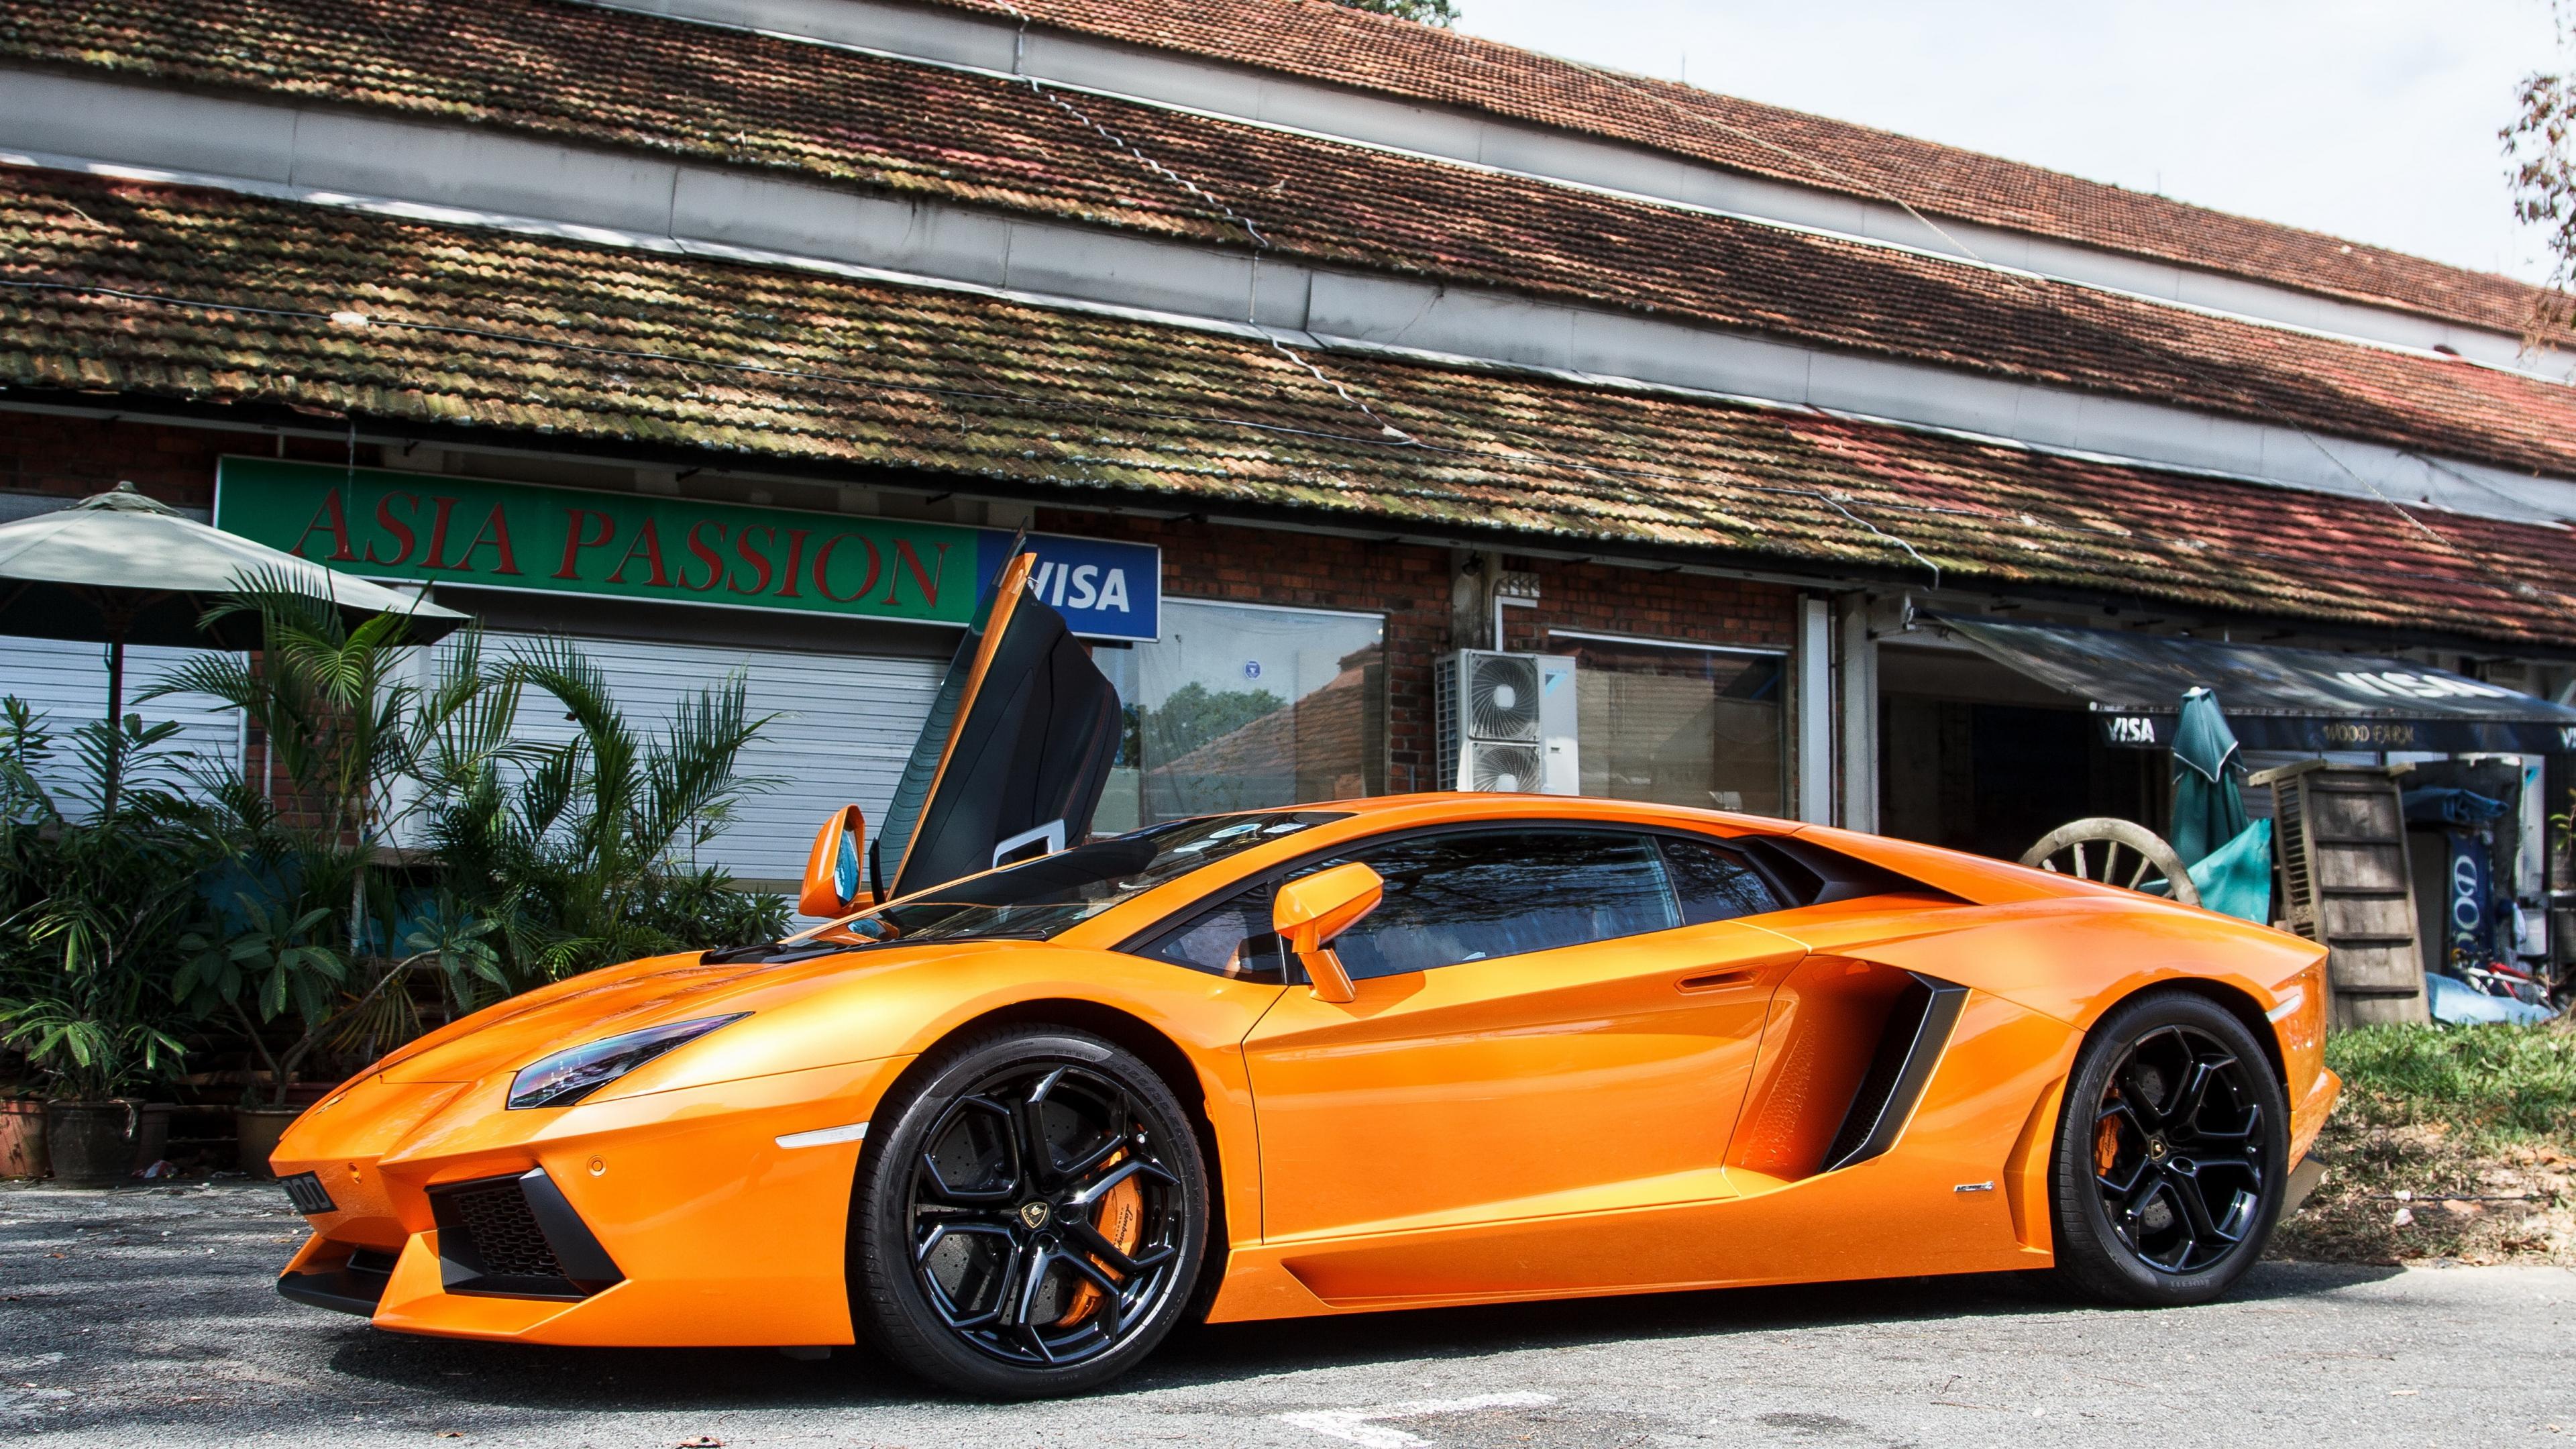 2015 <b>Lamborghini Huracan</b> - Exterior Walkaround - Captured in <b>4K</b> ...